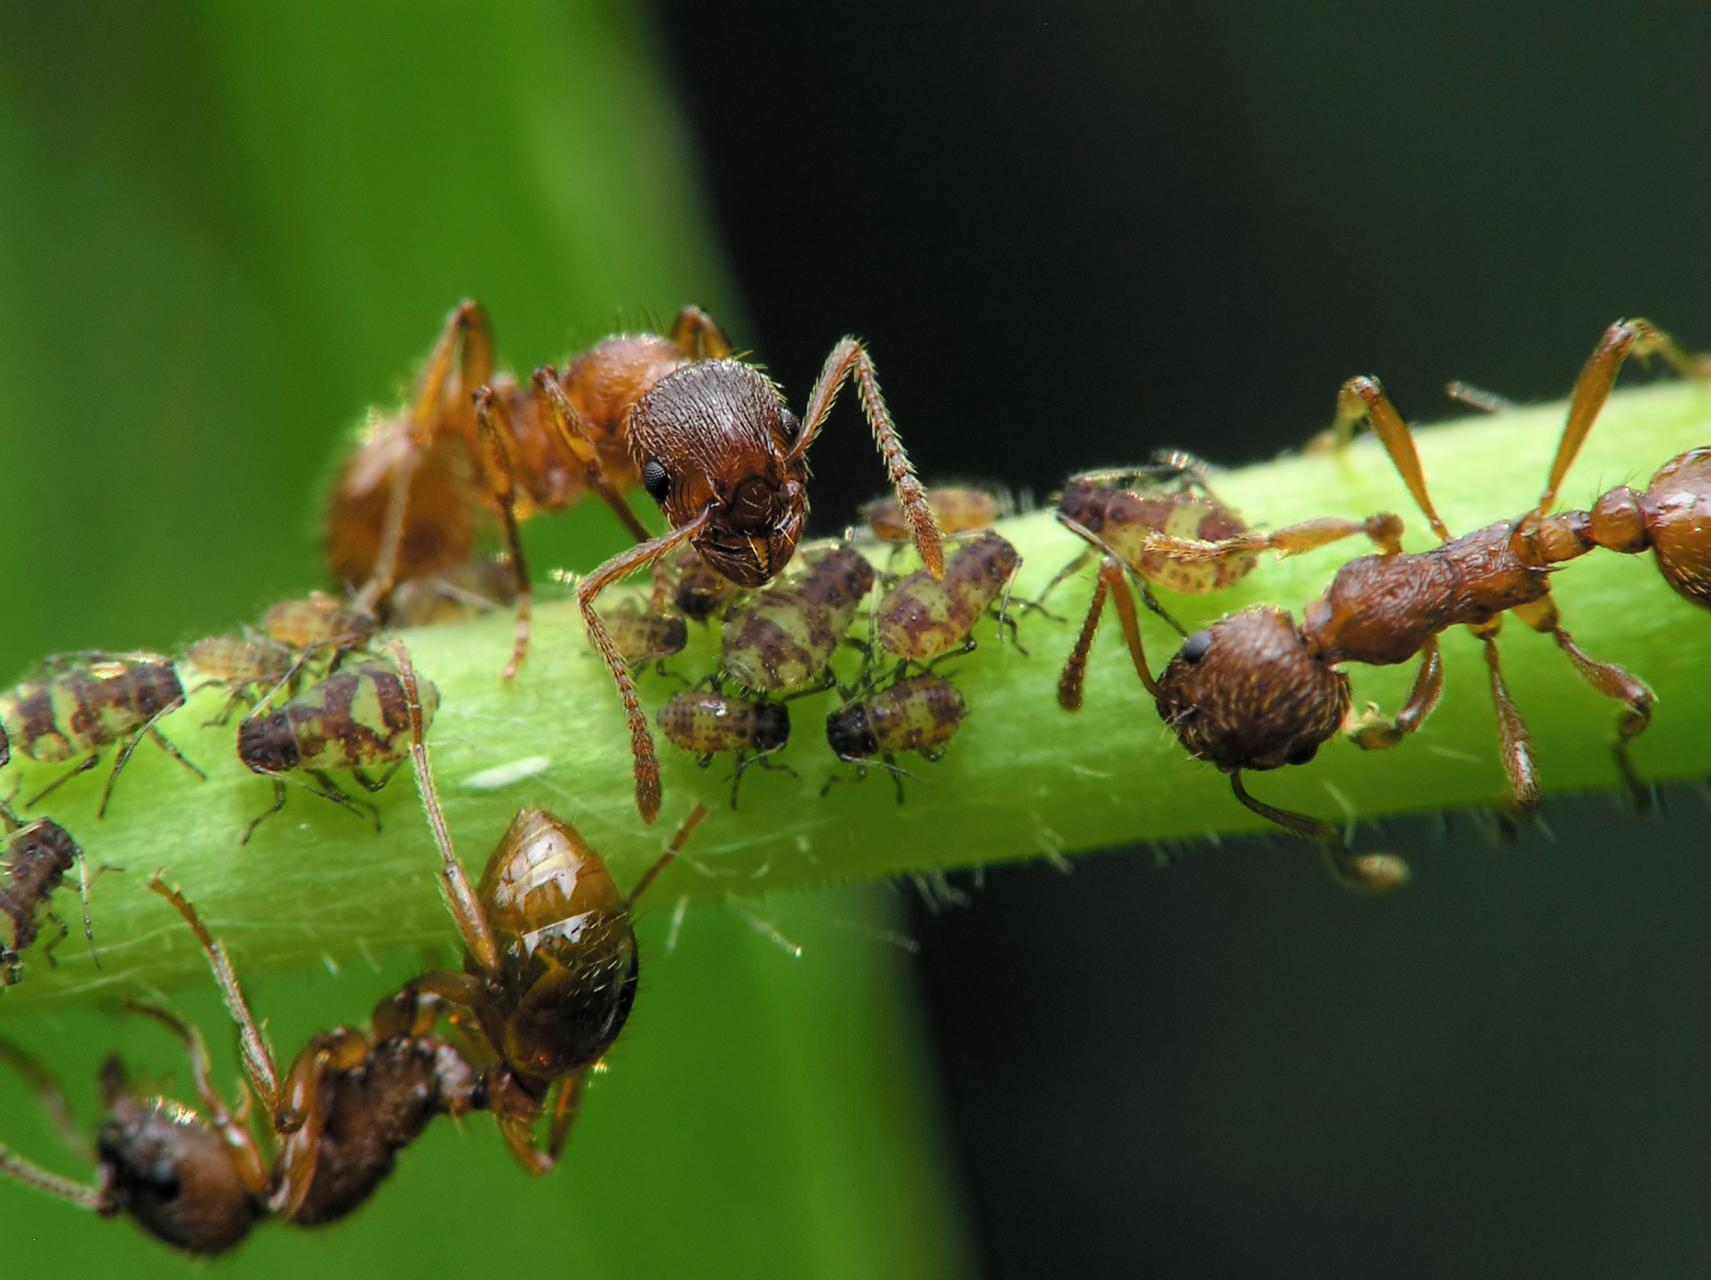 Organic Ant Control Dummer Garden Manage Gfinger Is The Best Garden Manage App